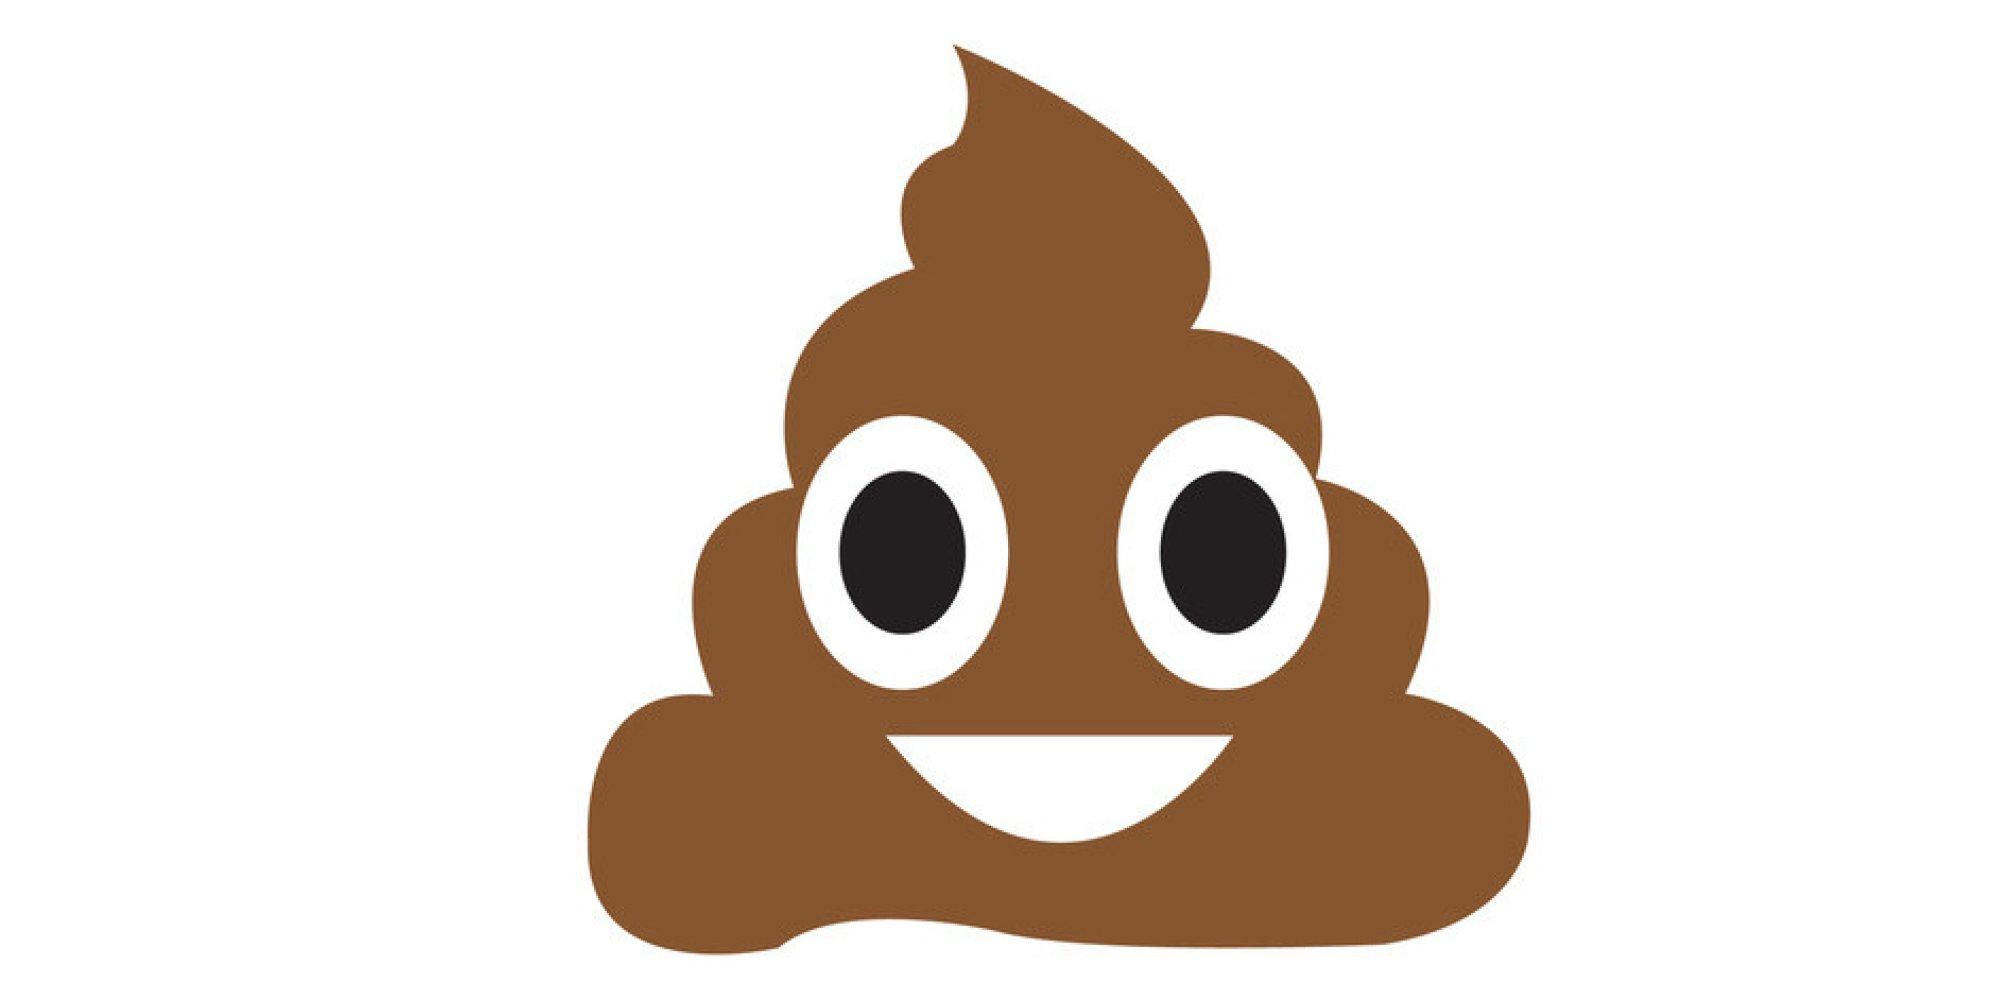 Poop hershey clip art